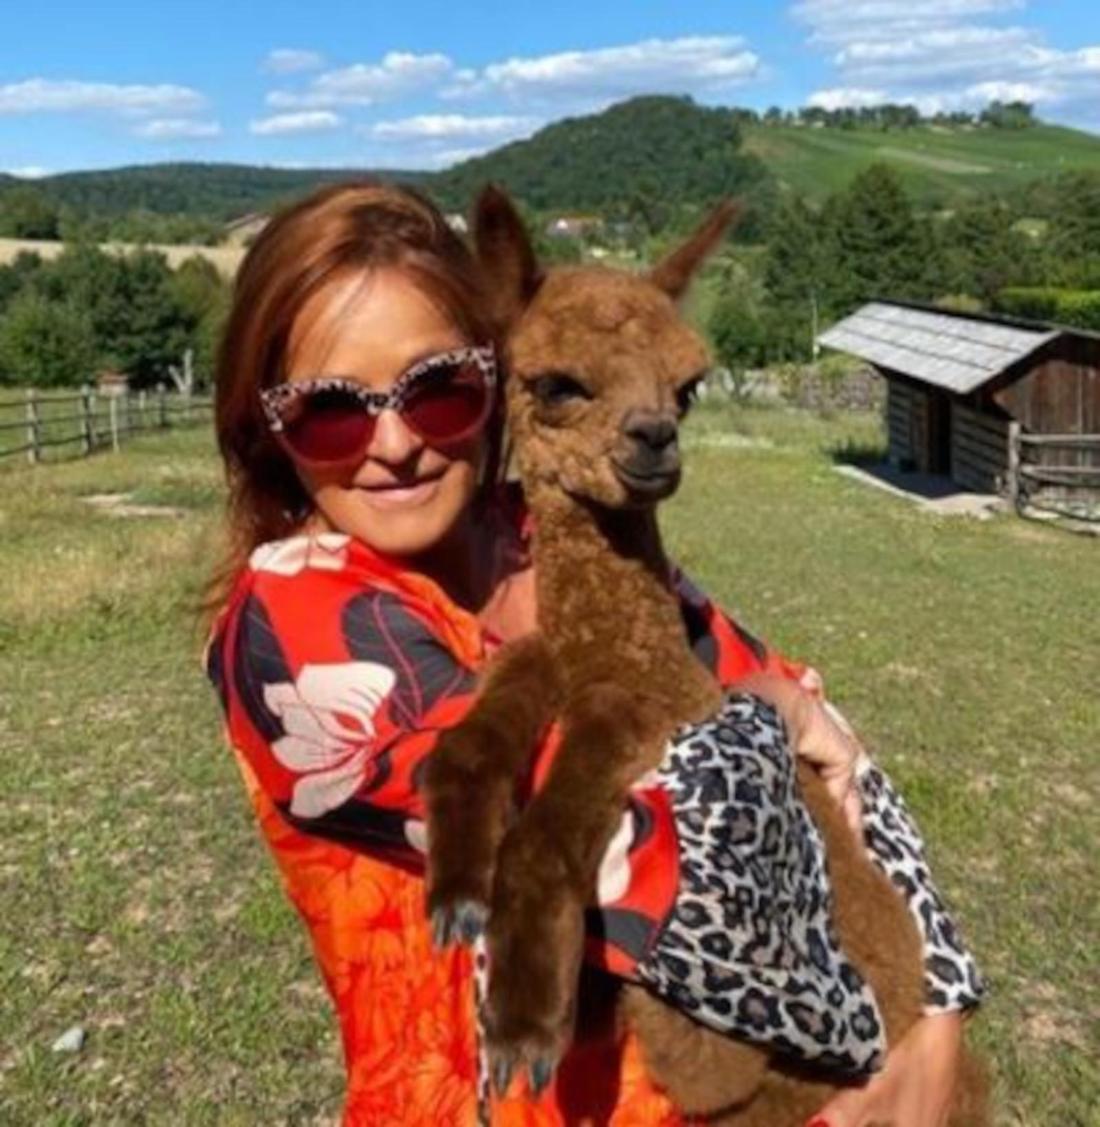 Andrea Berg hält ein Baby-Alpaka auf dem Arm